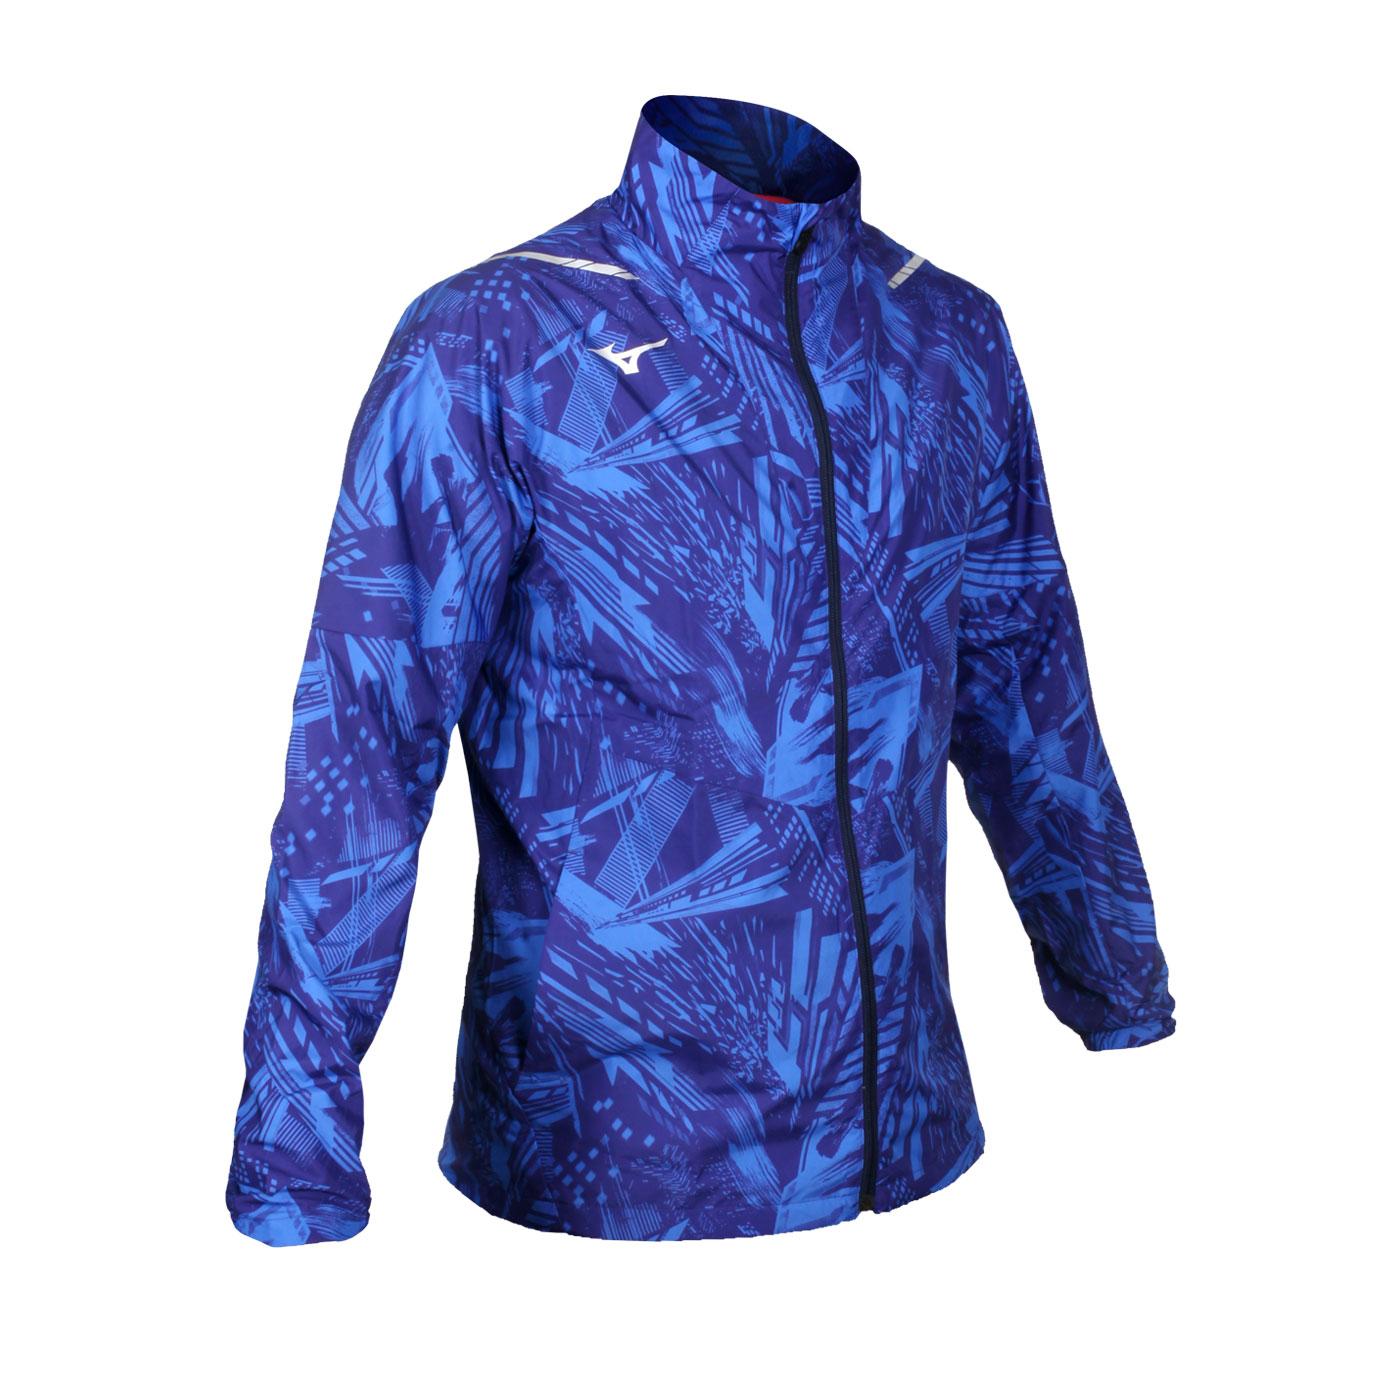 MIZUNO 男款平織運動外套 32ME051020 - 藍銀